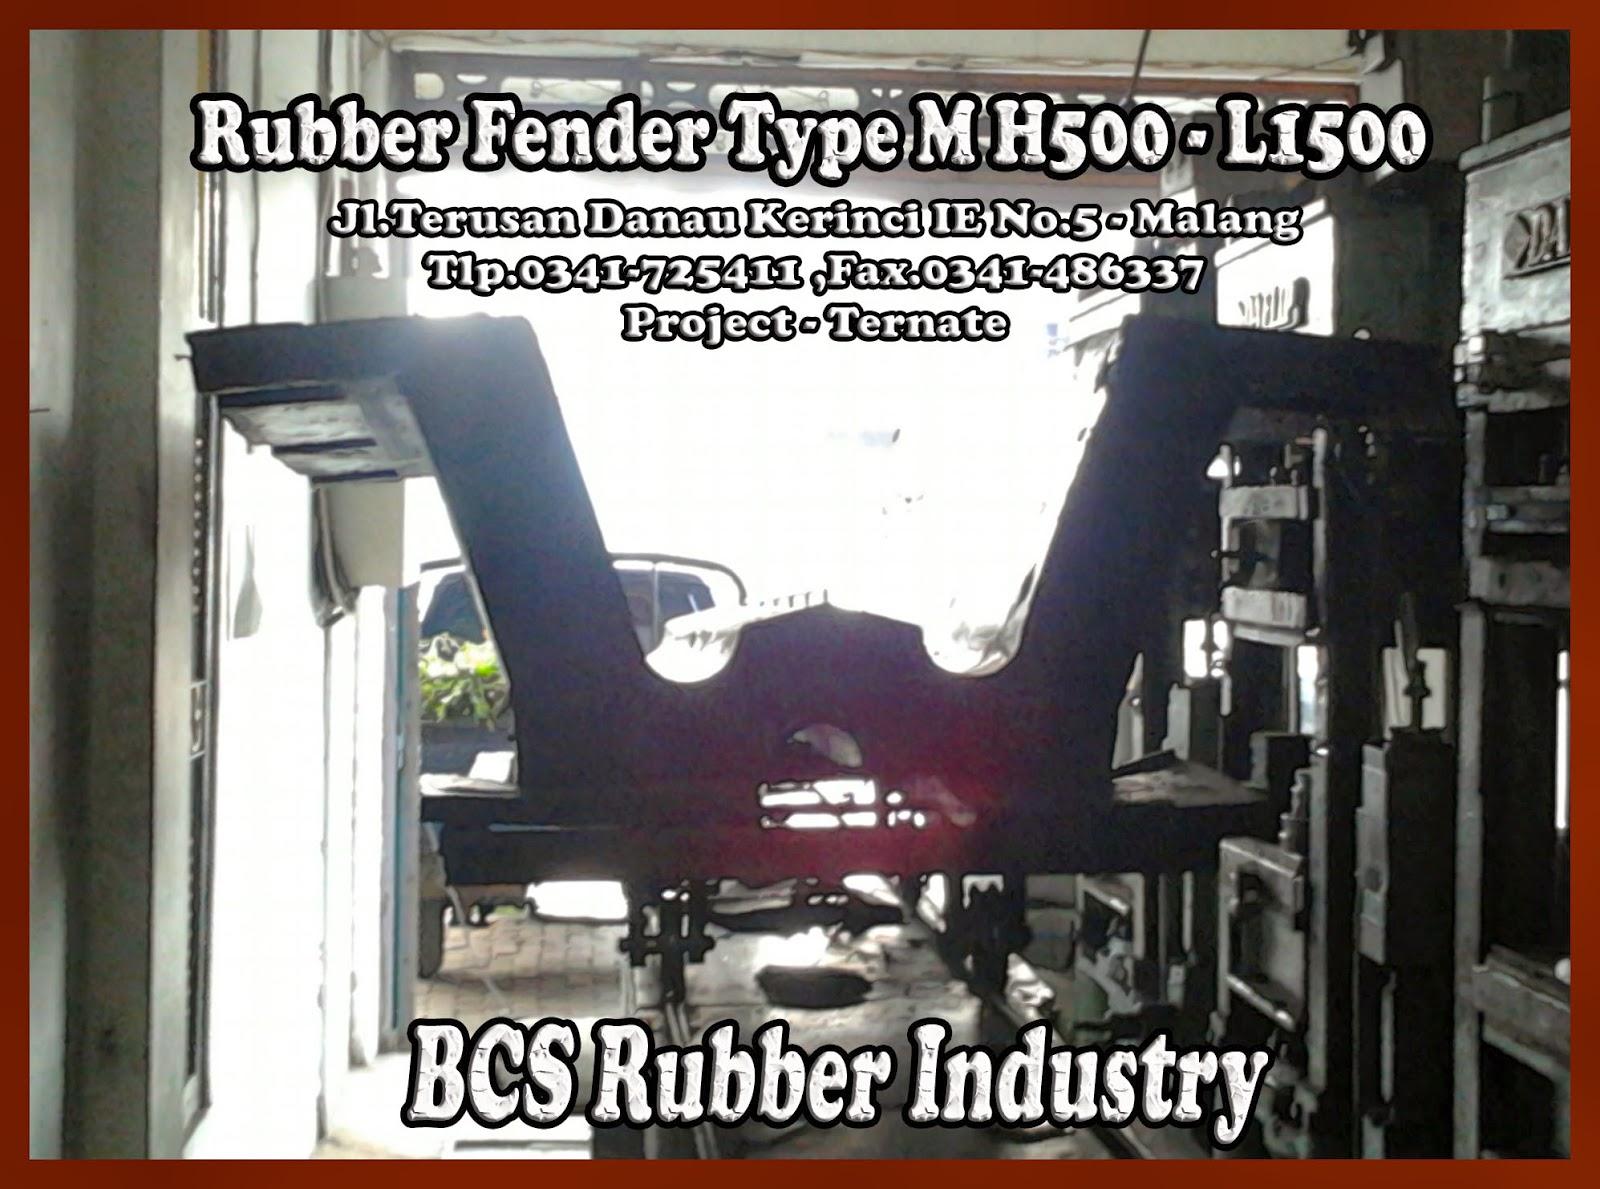 RUBBER FENDER M, FENDER DERMAGA INDONESIA, ELASTOMER RUBBER FENDER,MARINE FENDER BY BCS RUBBER INDUSTRY